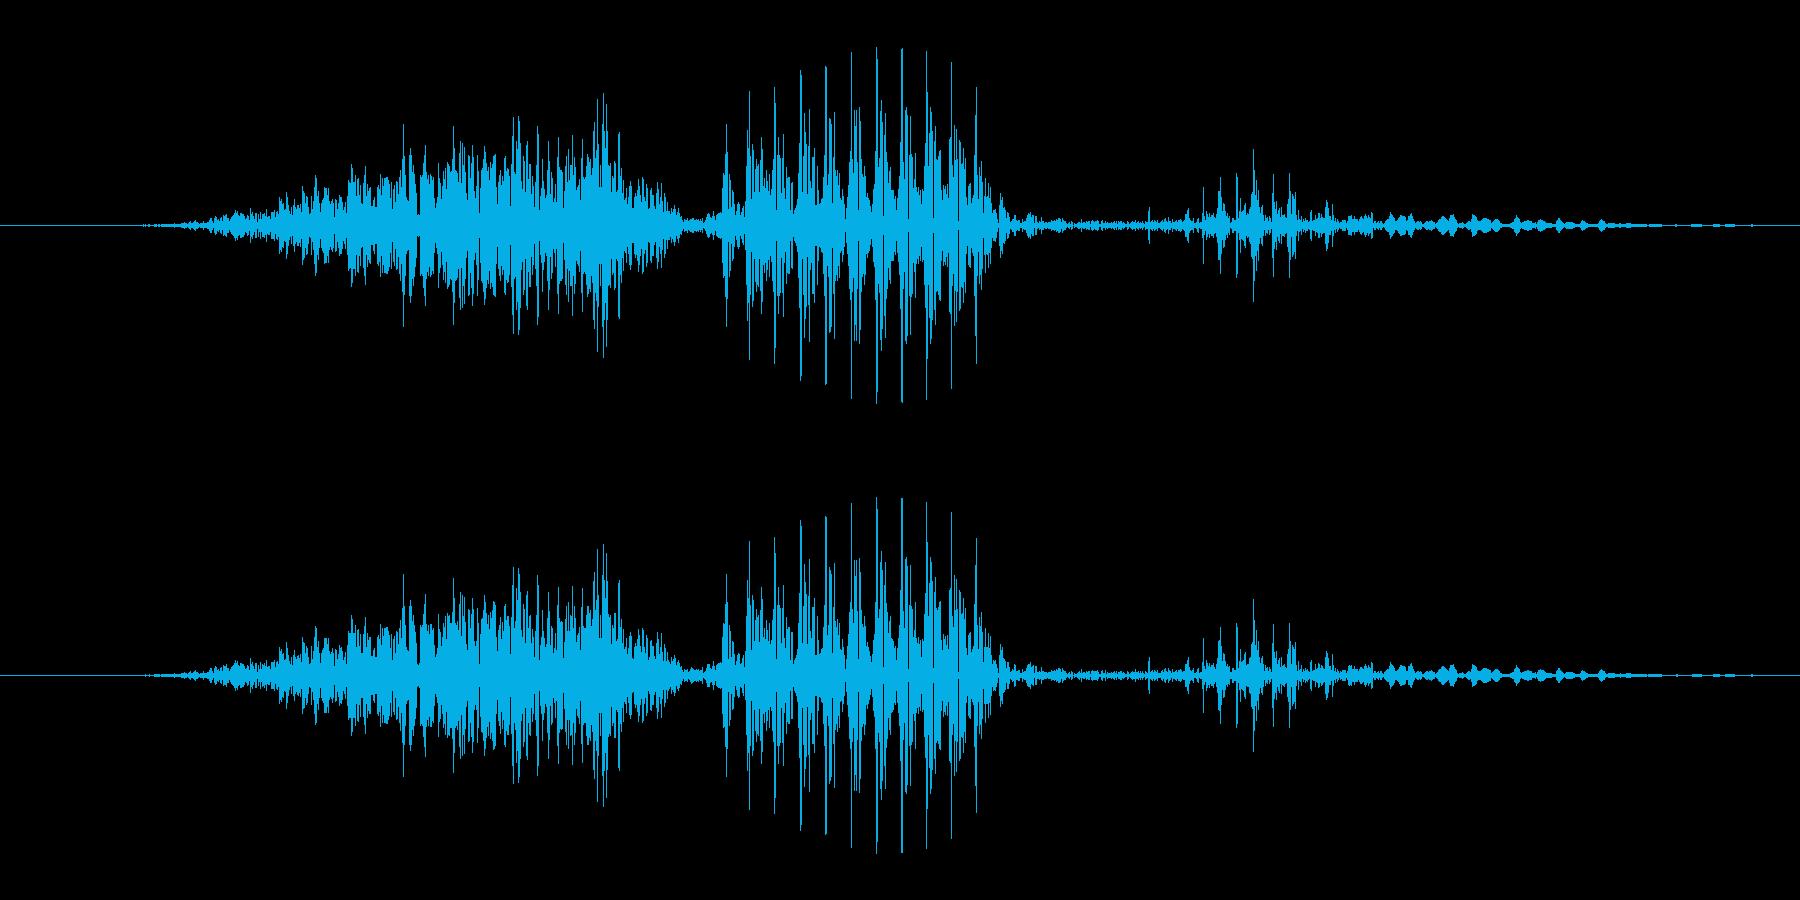 7 (seven, 英語、米国男性声優…の再生済みの波形